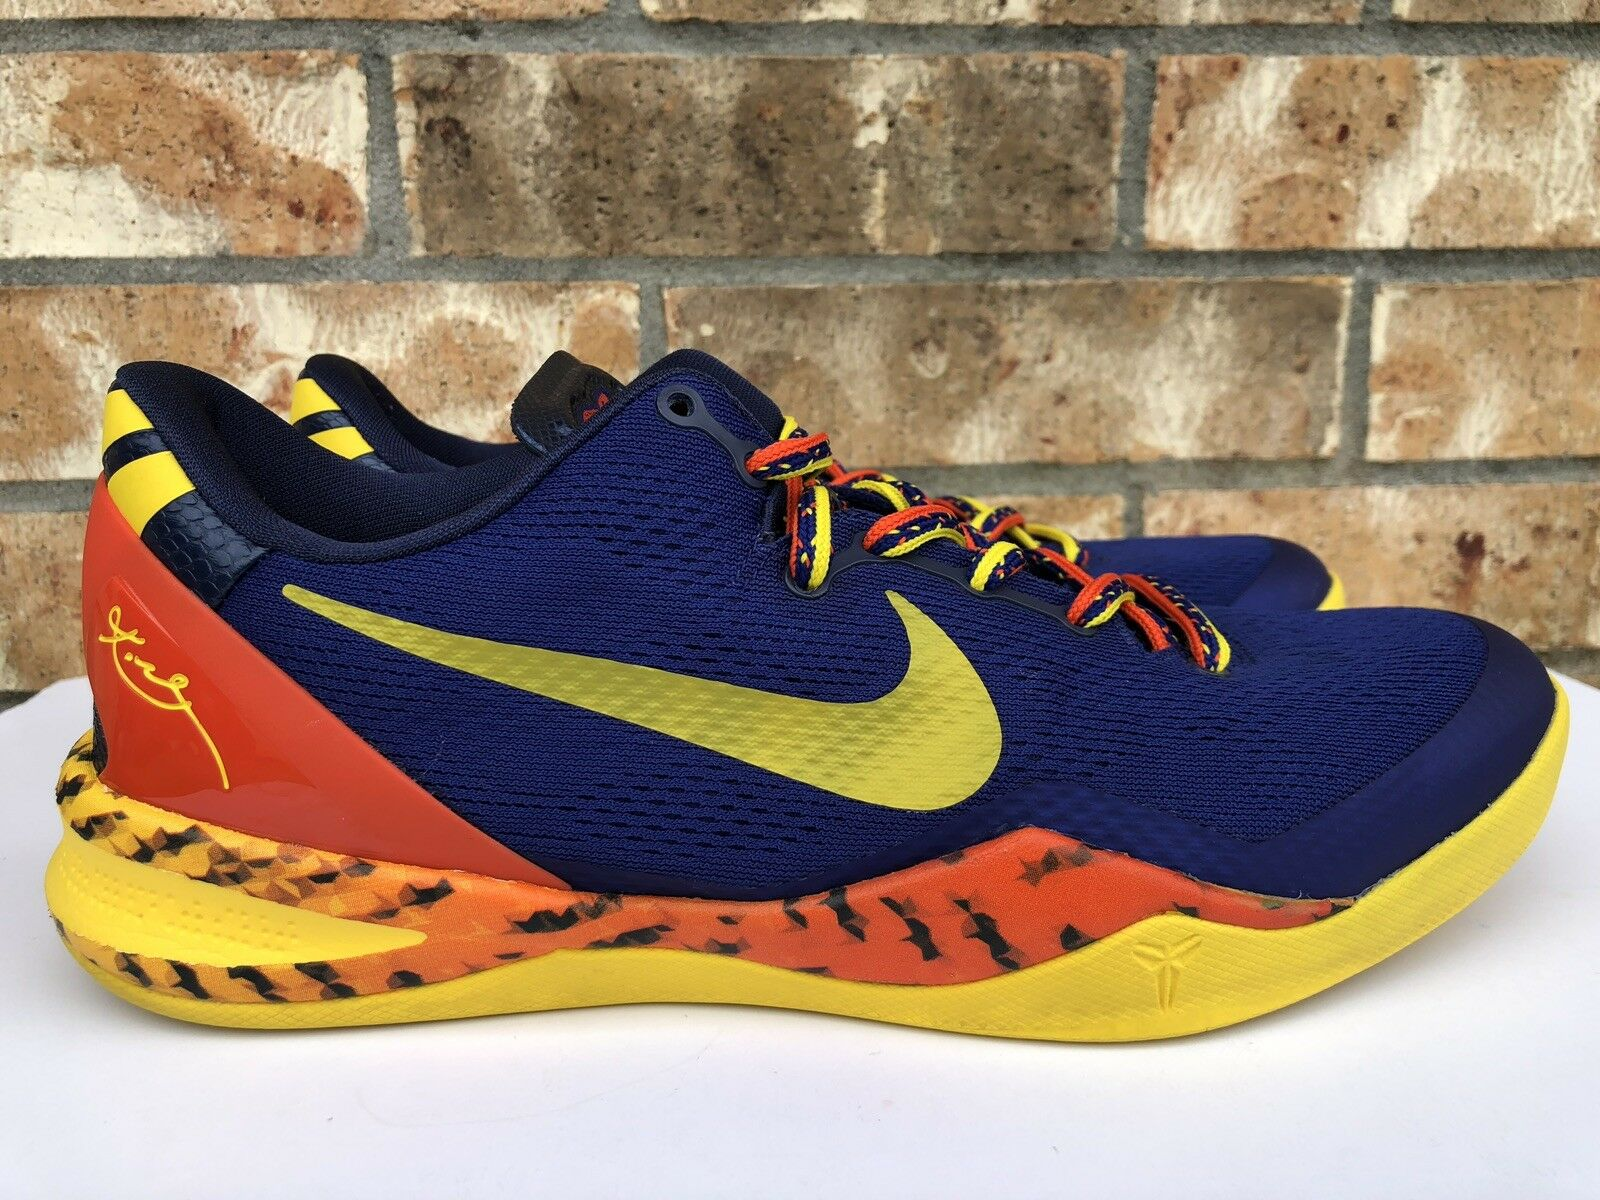 Men's Nike Kobe 8 System Barcelona Tiger Basketball shoes Size 9.5 555035-402